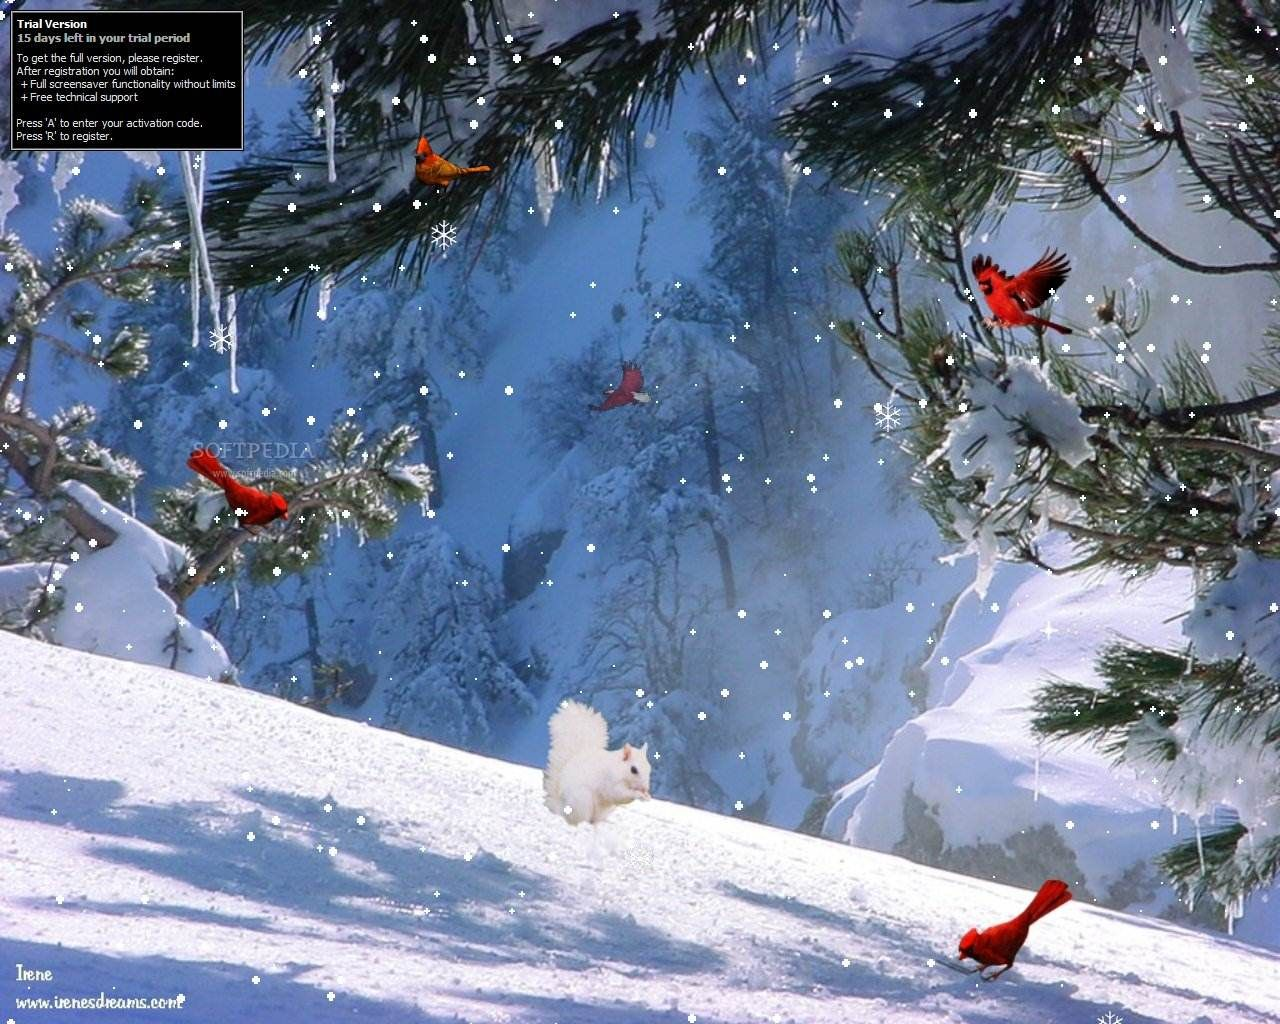 Microsoft Winter Screensavers And Wallpaper Winter Wallpaper Free Winter Wallpaper Iphone Wallpaper Winter